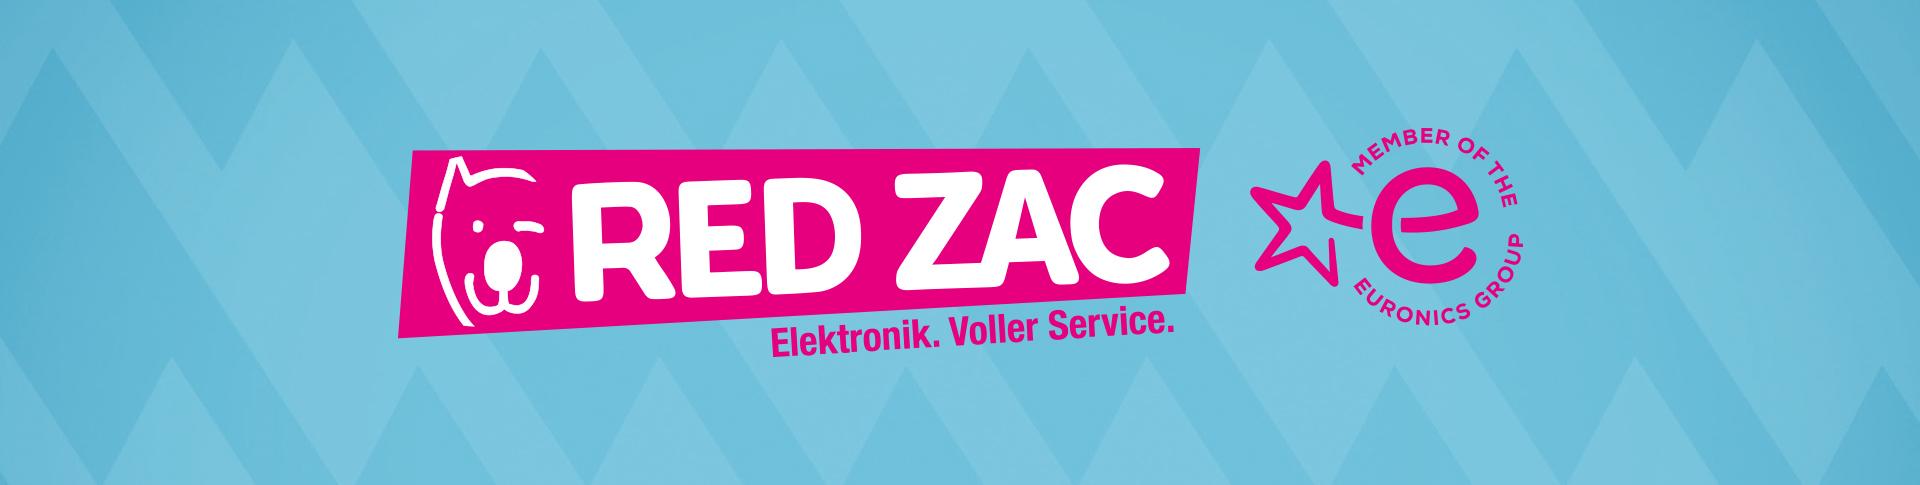 Digitale Transformation RED ZAC Titel